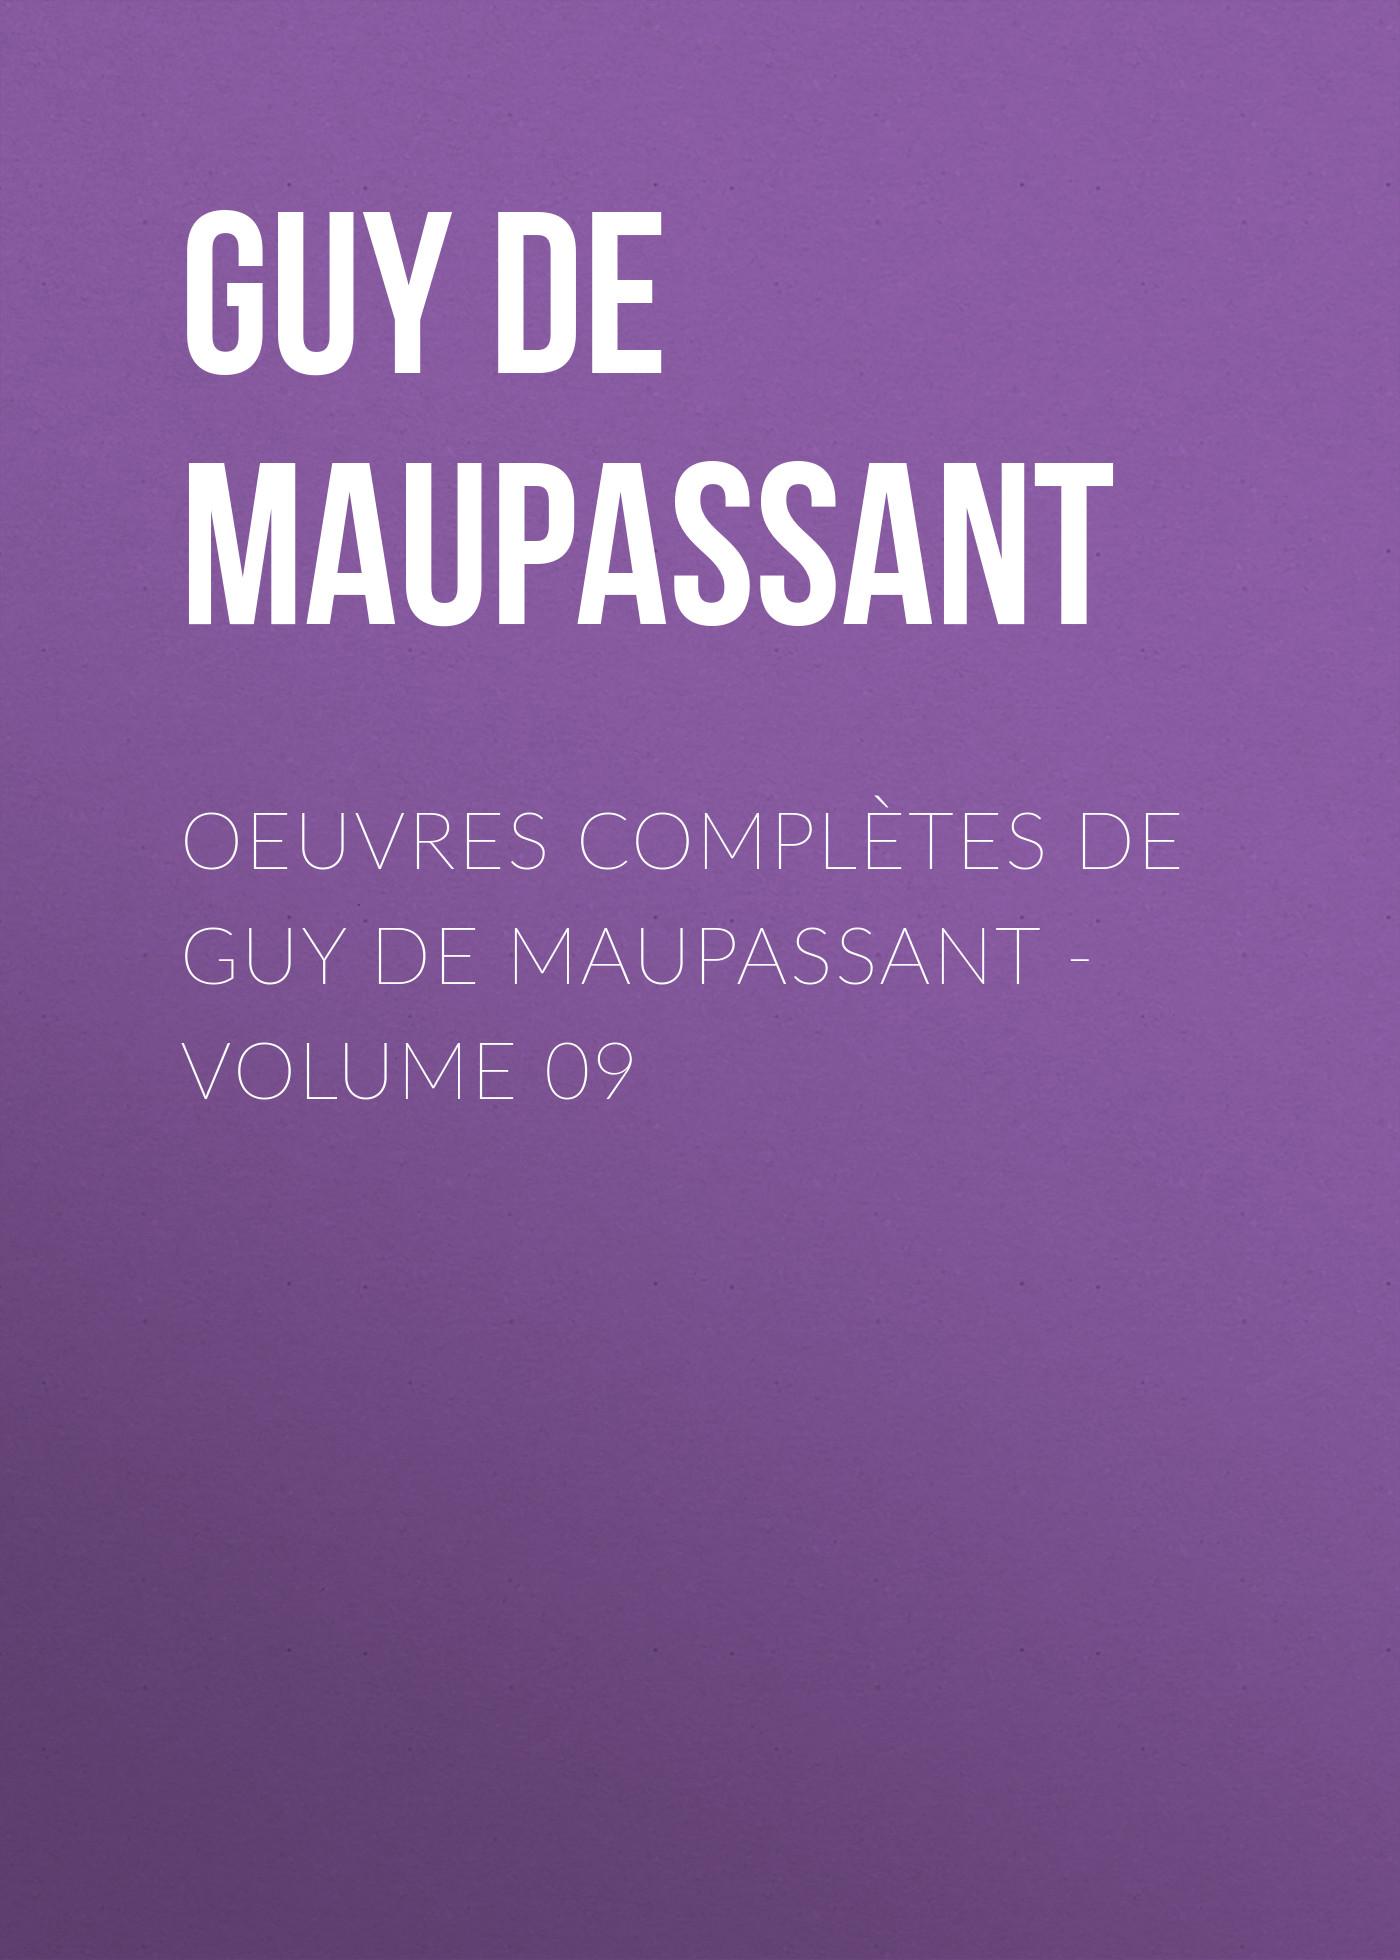 цена на Ги де Мопассан OEuvres complètes de Guy de Maupassant - volume 09